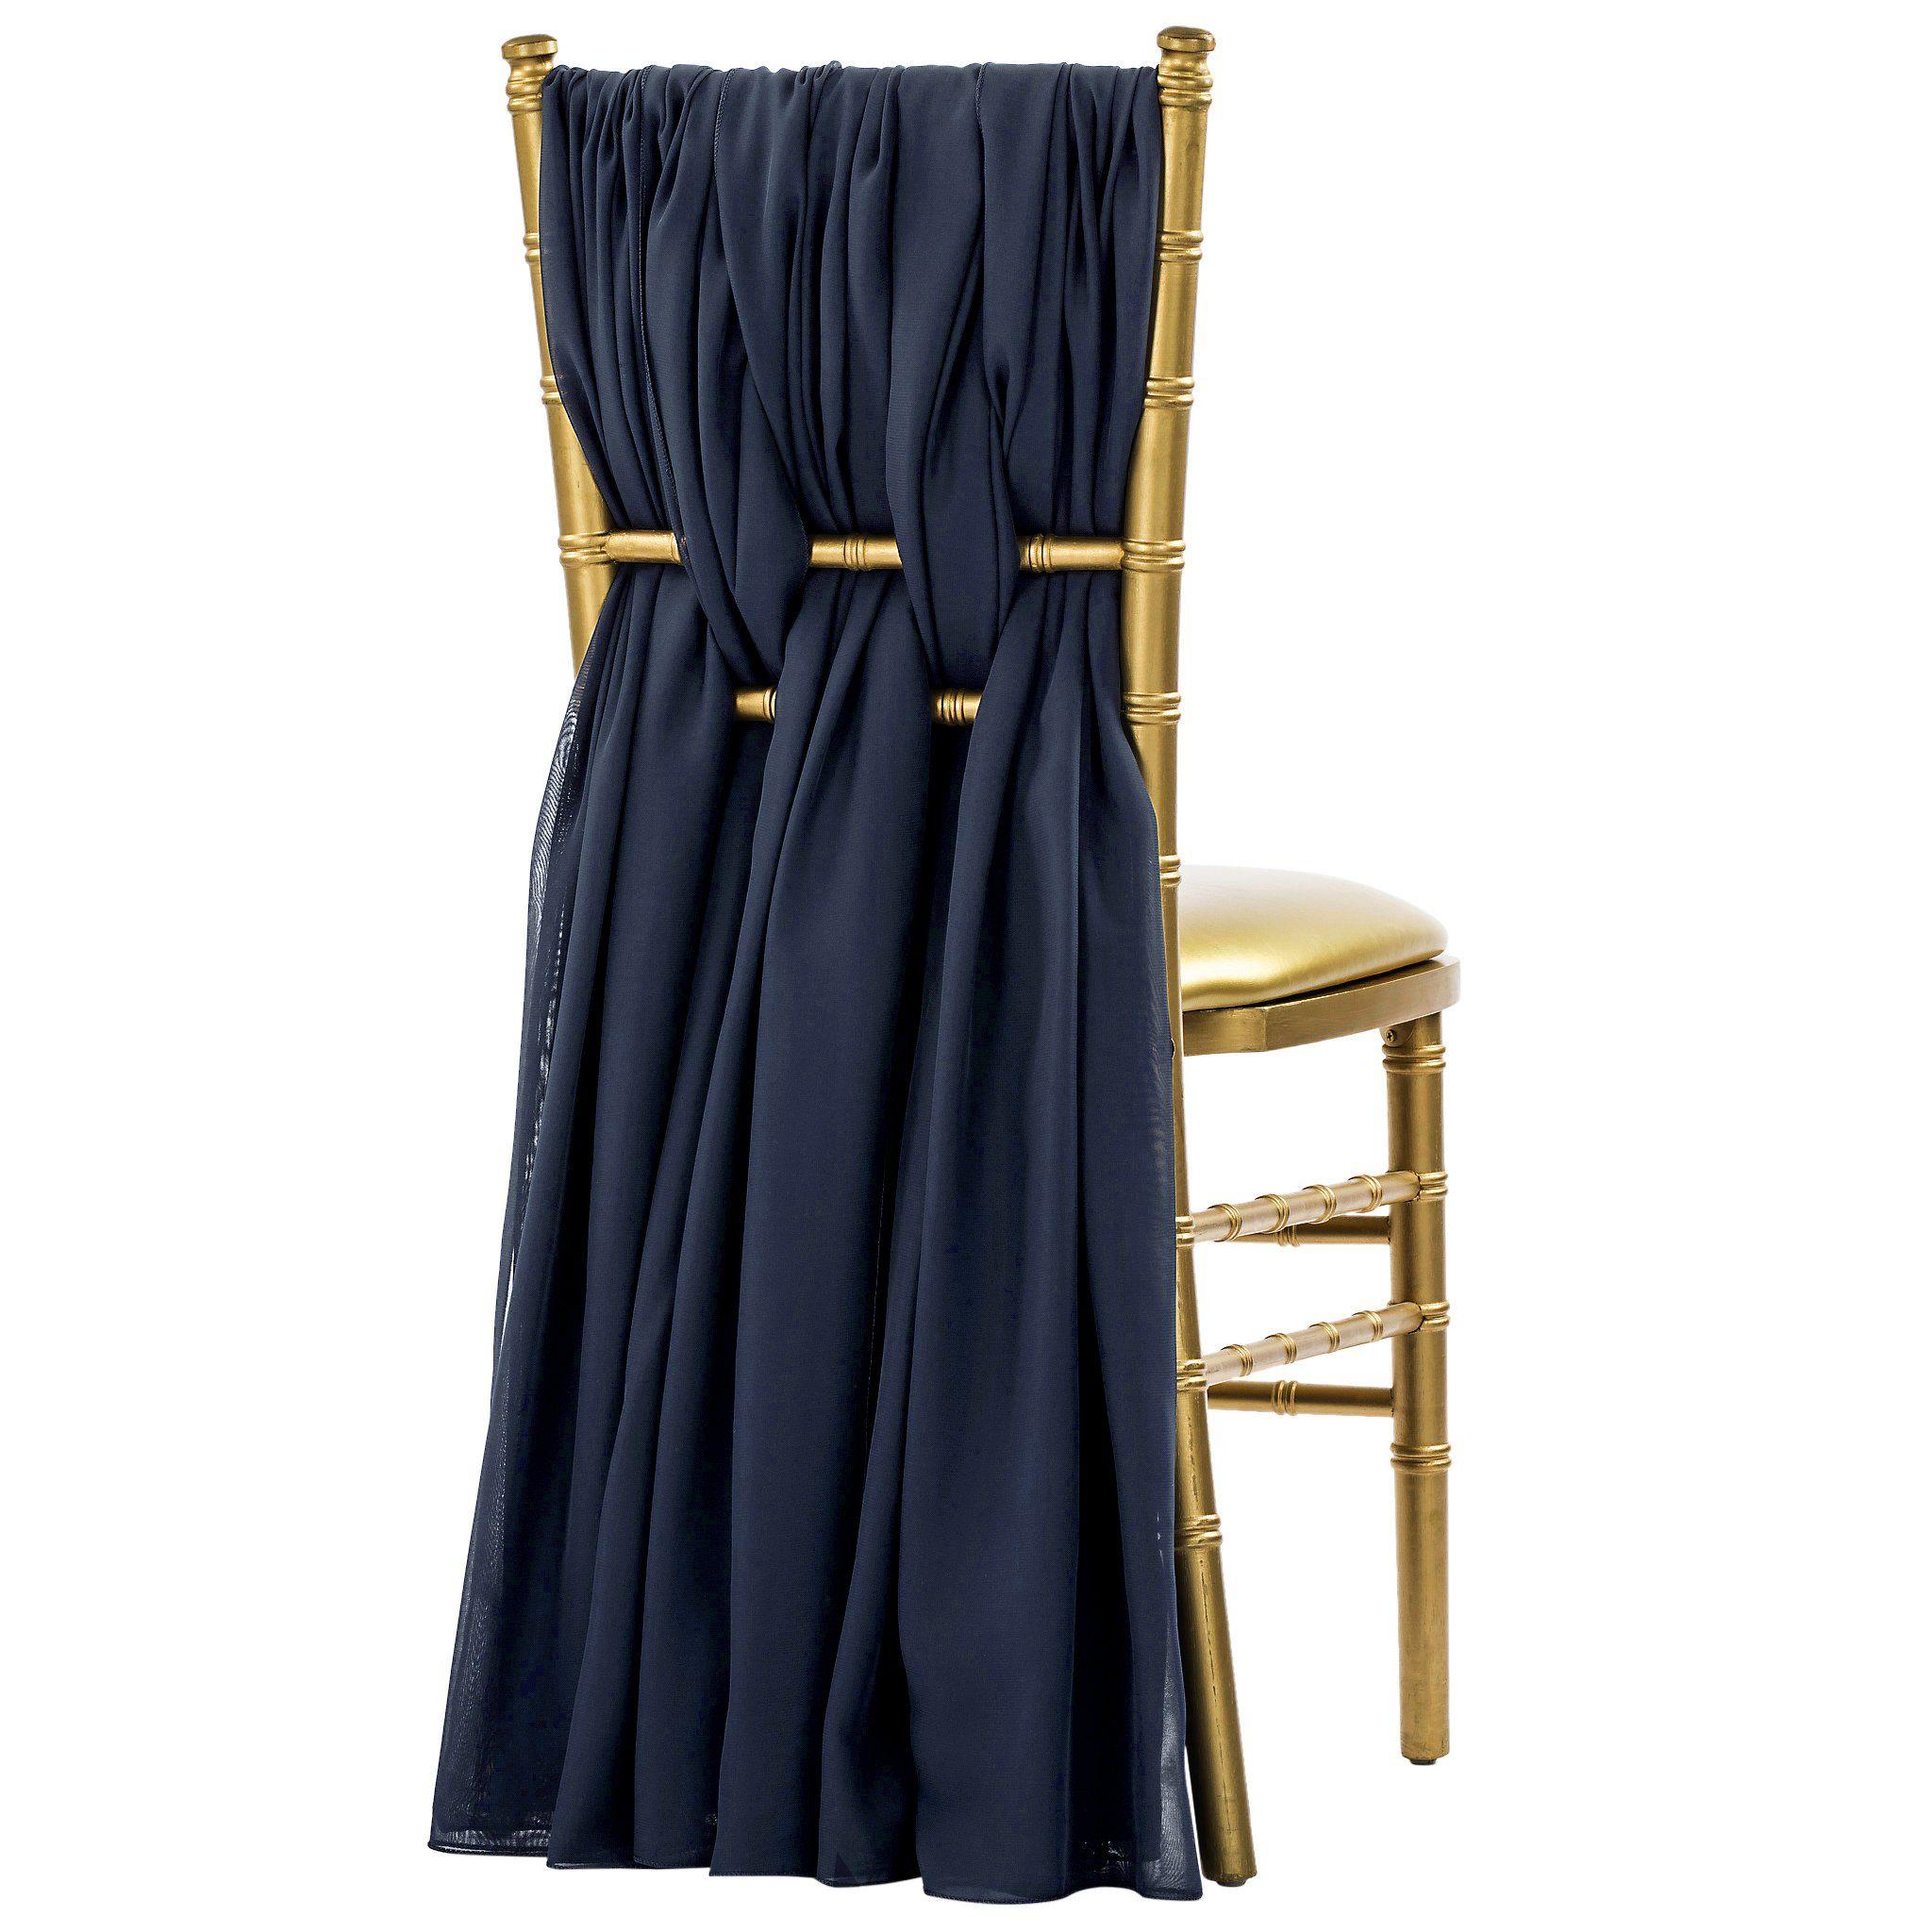 5pcs Pack of Chiffon Chair Sashes/Ties - Navy Blue